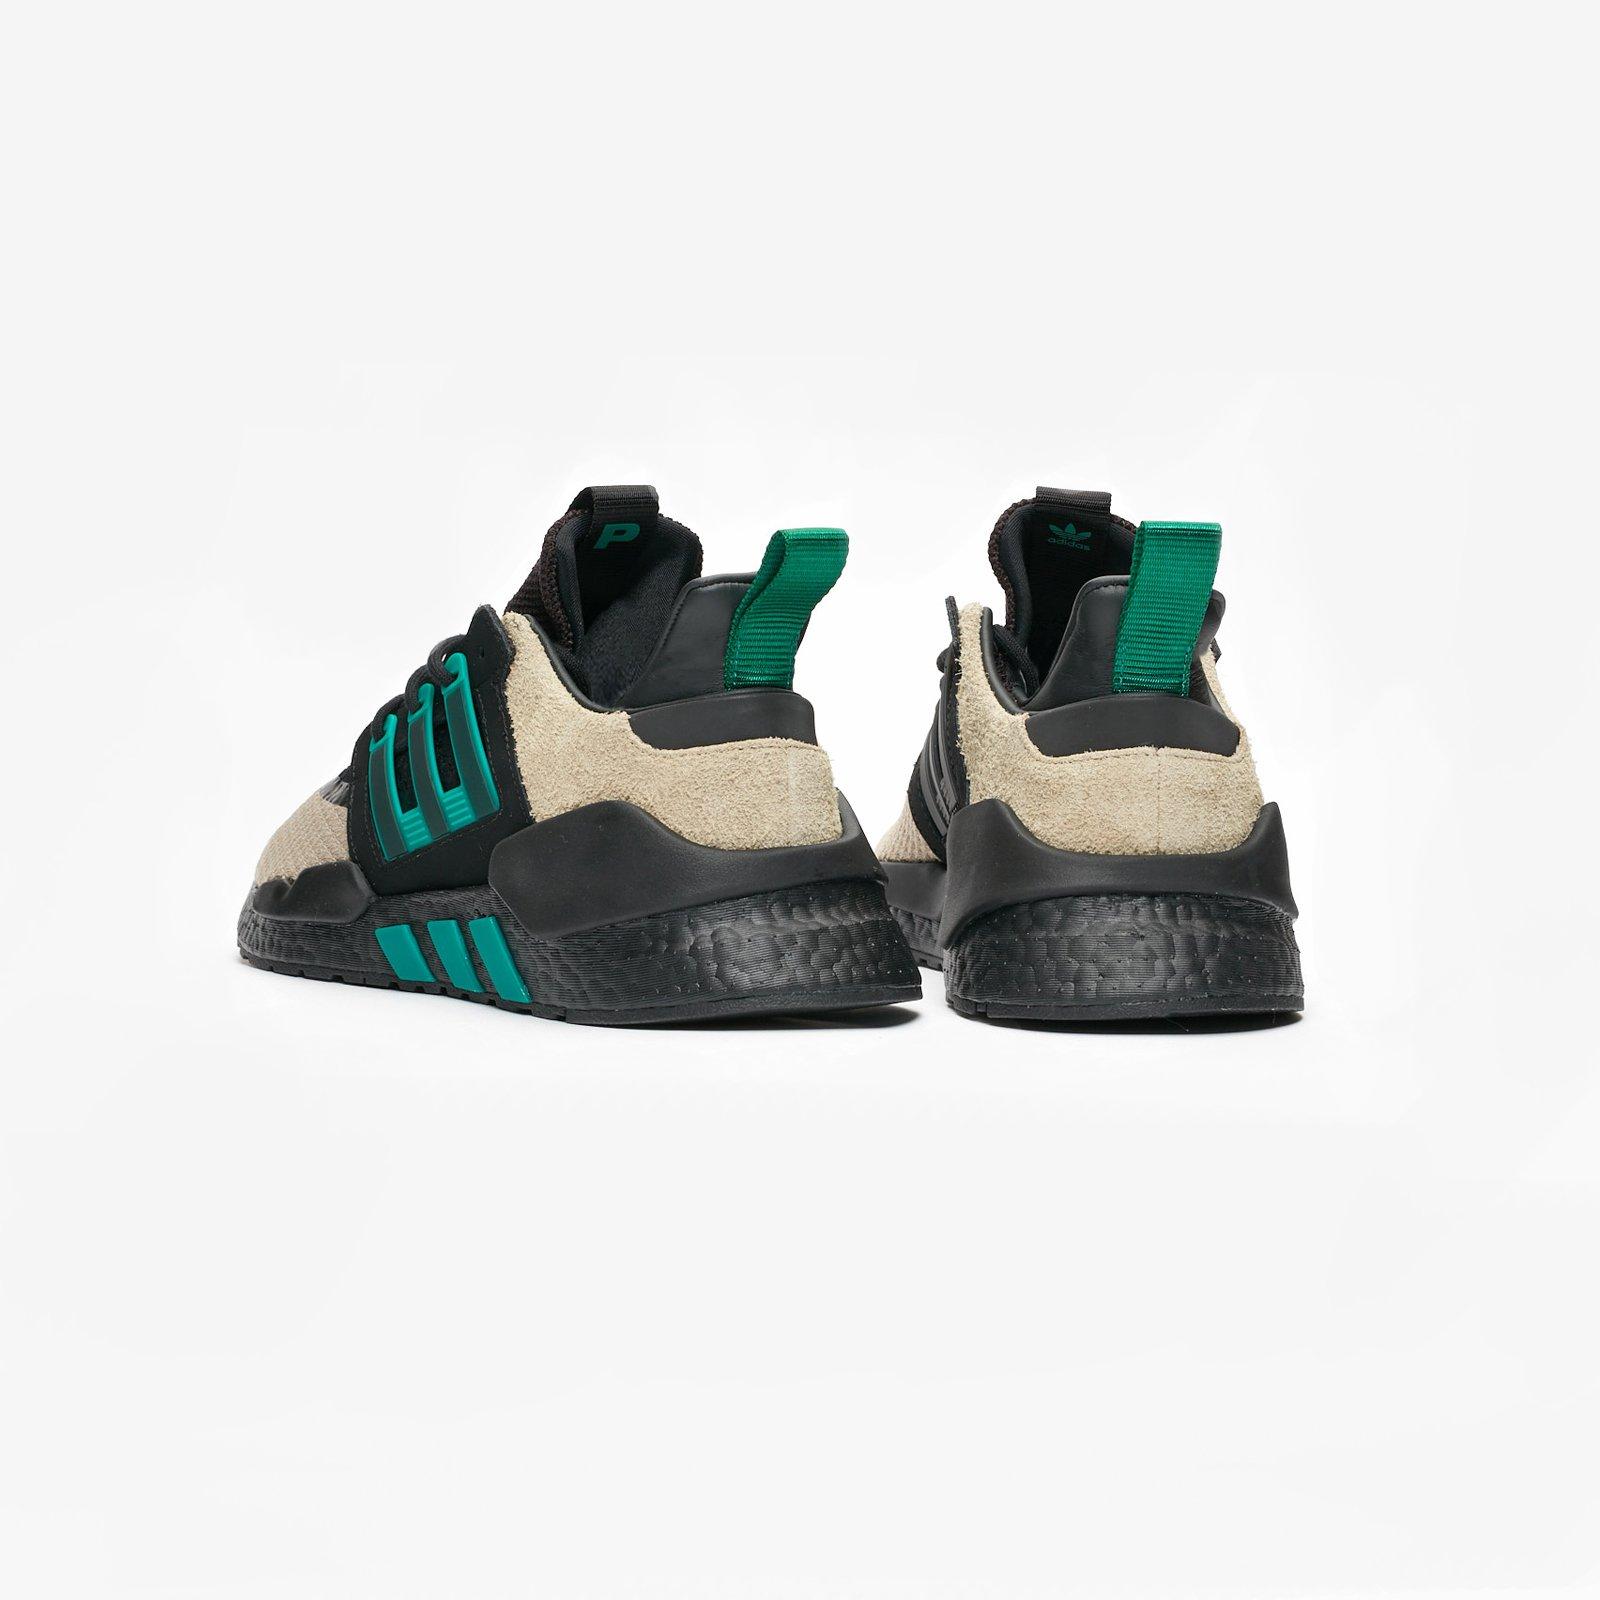 various colors 530d0 62eb7 adidas EQT 91/18 x Packer - Bb9482 - Sneakersnstuff ...